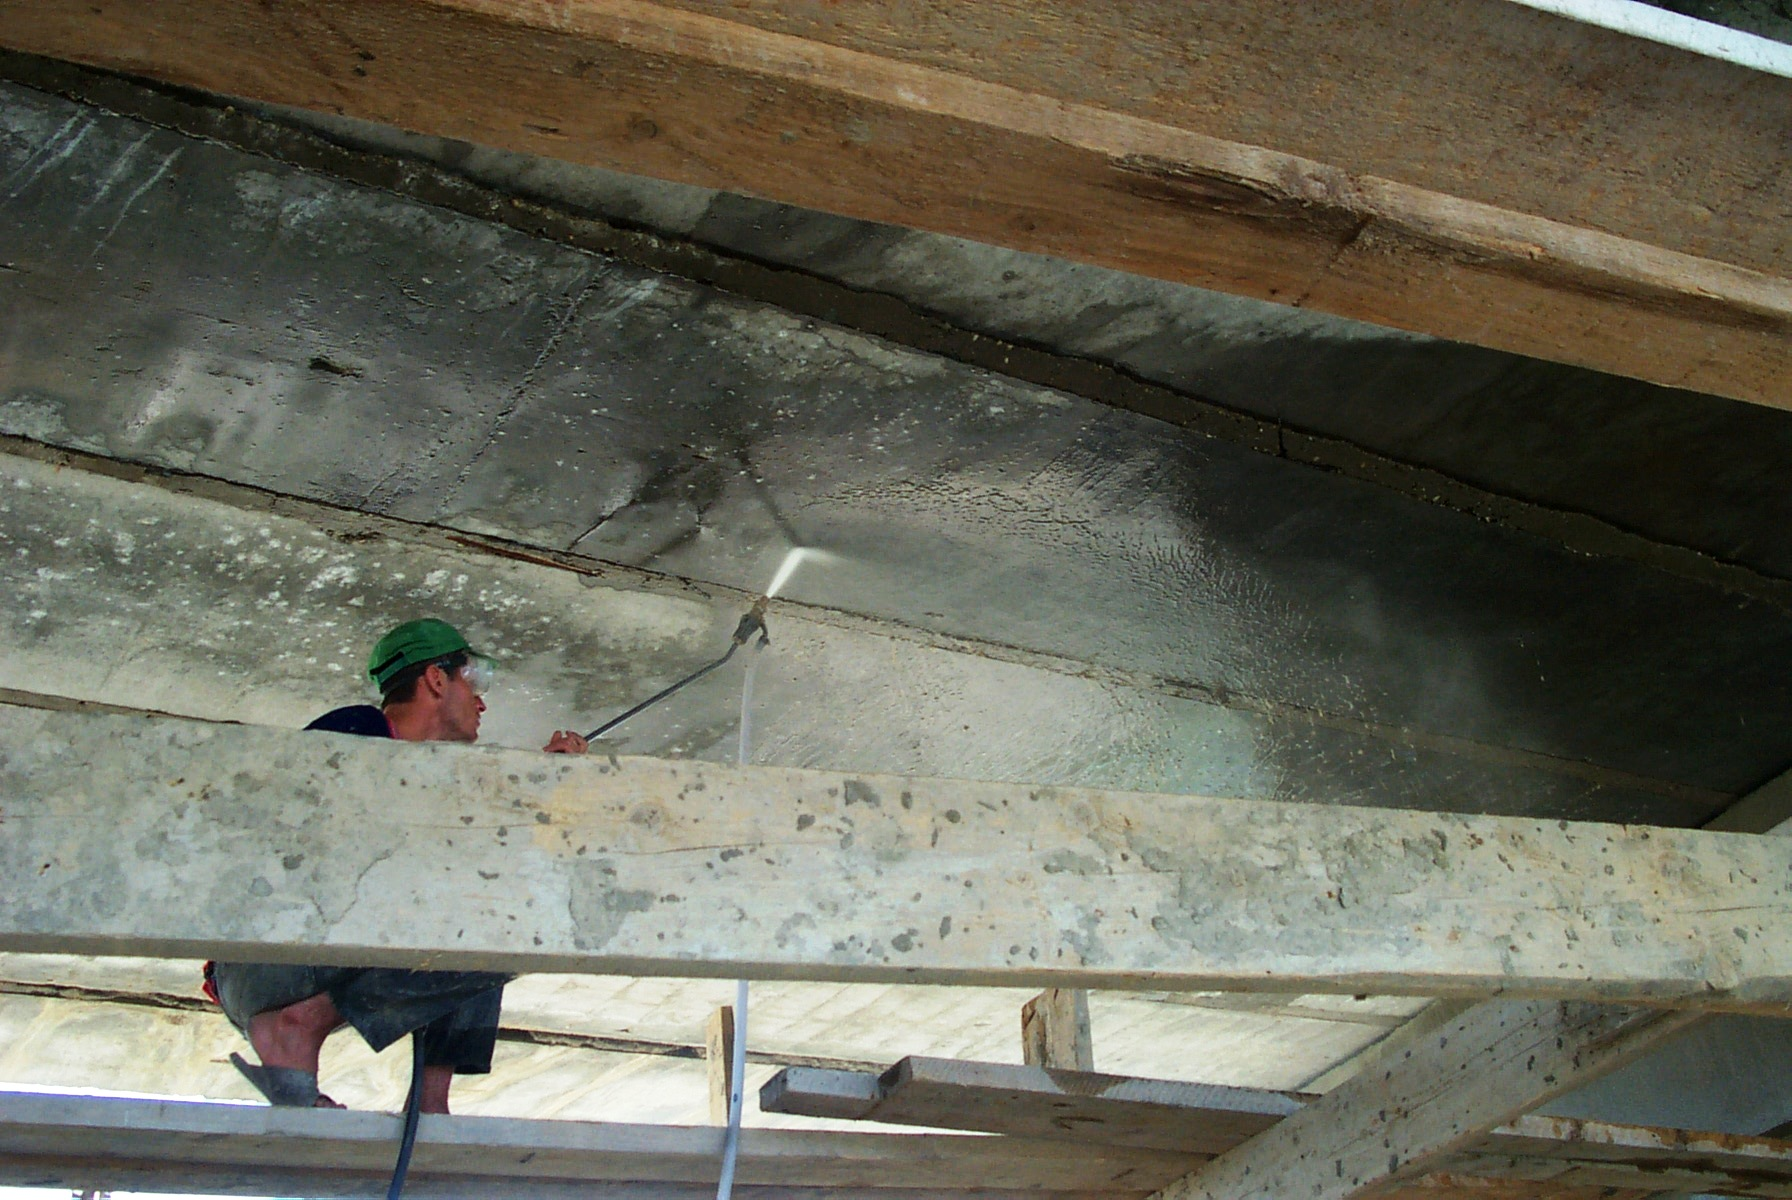 Reparatii pod (DN2), Km. 33 - 028, peste raul Calnistea MAPEI - Poza 107